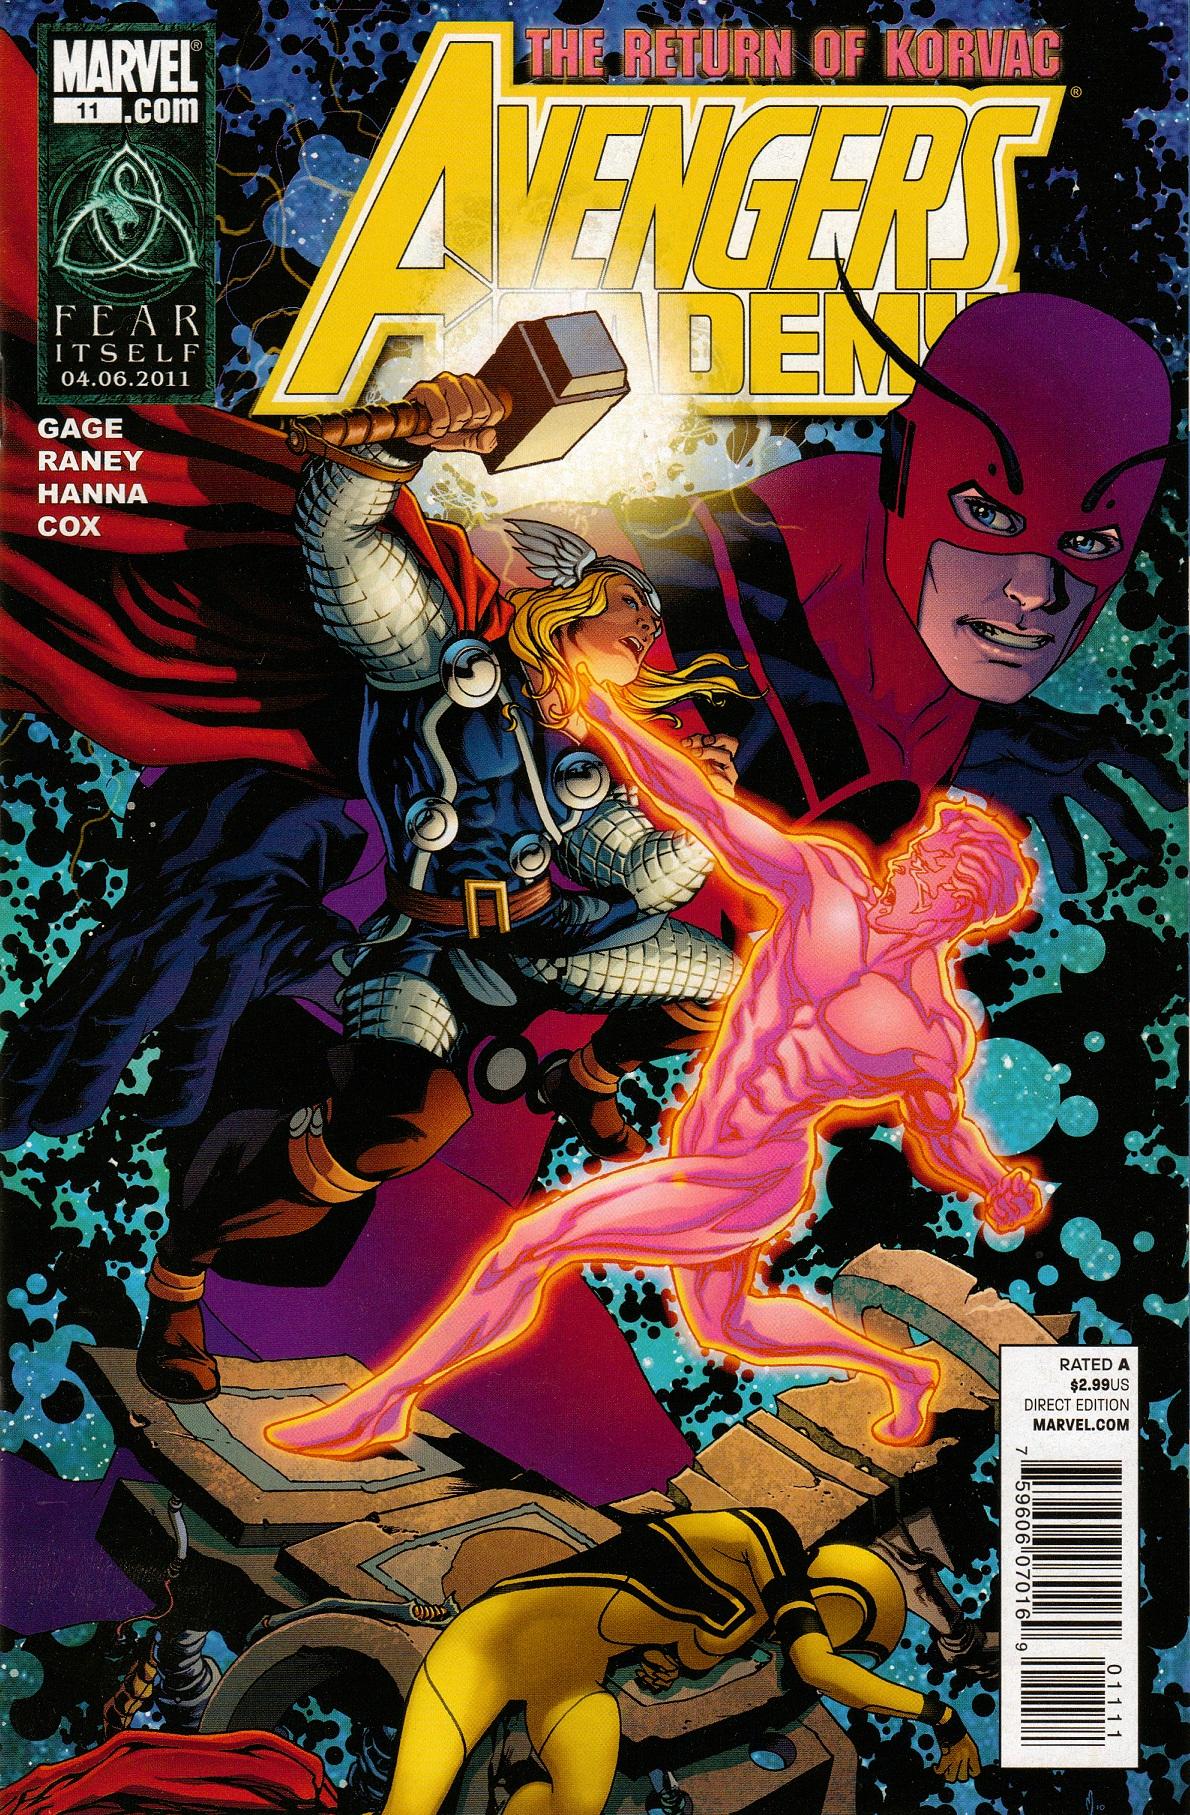 Avengers Academy Vol 1 11